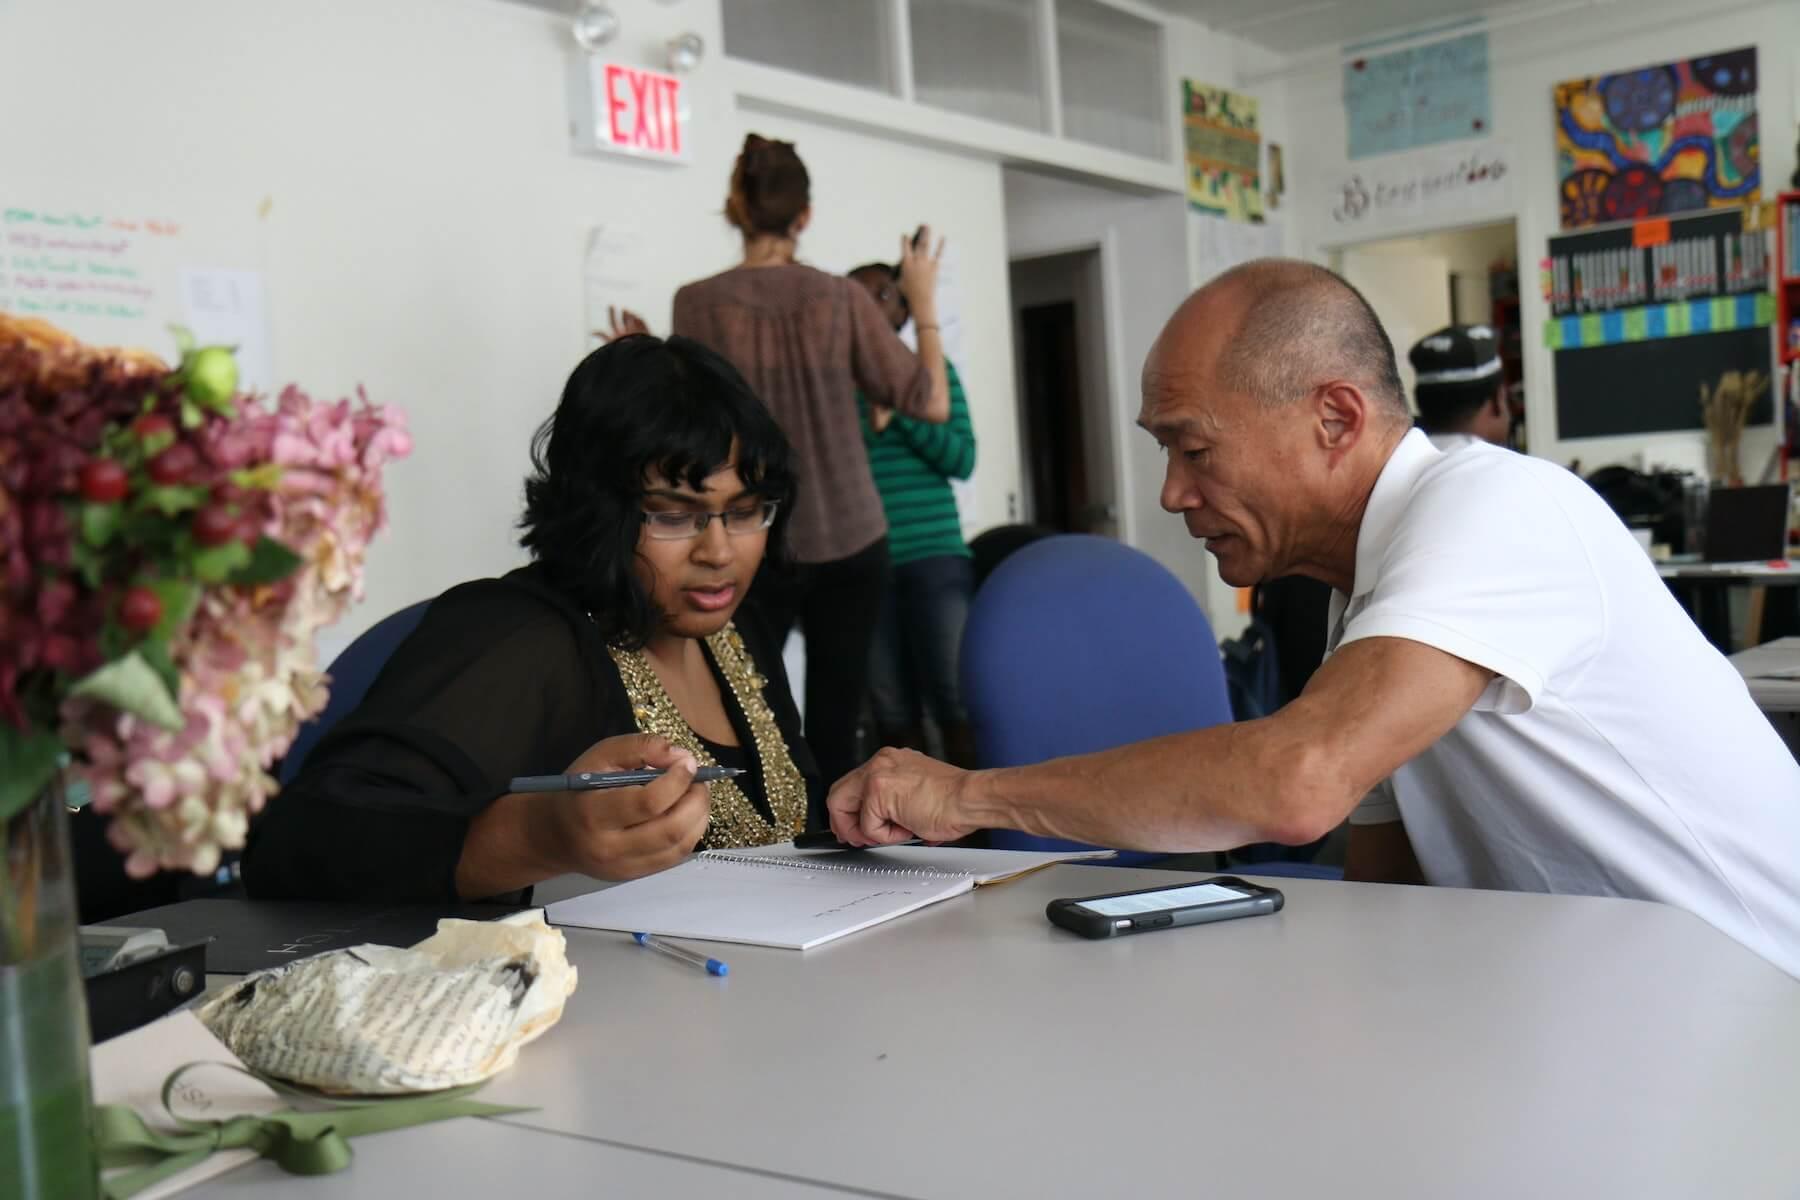 two people sitting at desk looking at notebook nurse mentorship